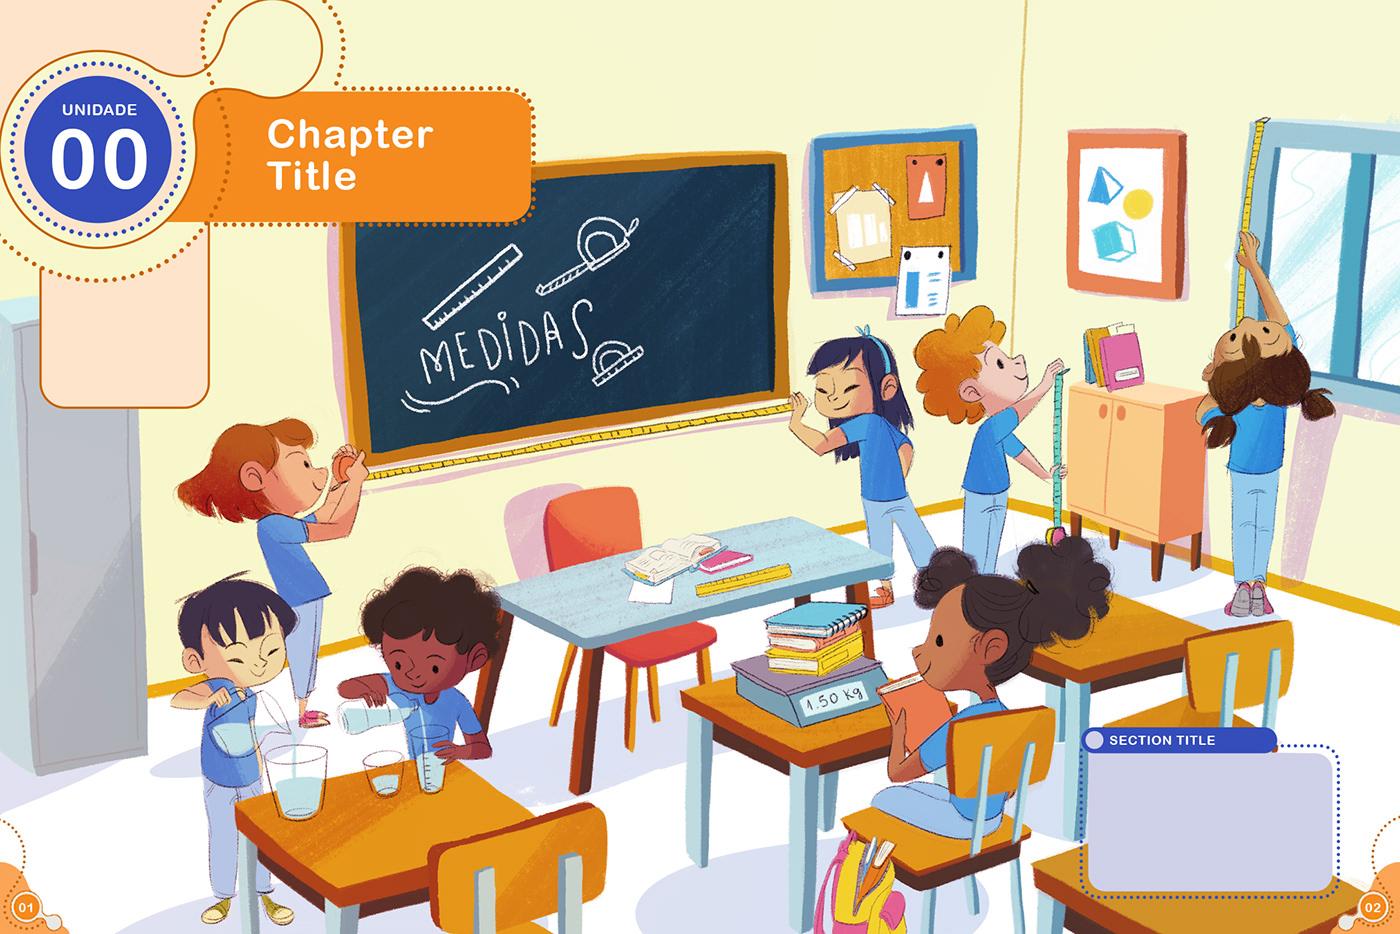 childrensbook picturebook didático textbook educacional livroinfantil childrens school beatriz mayumi Character